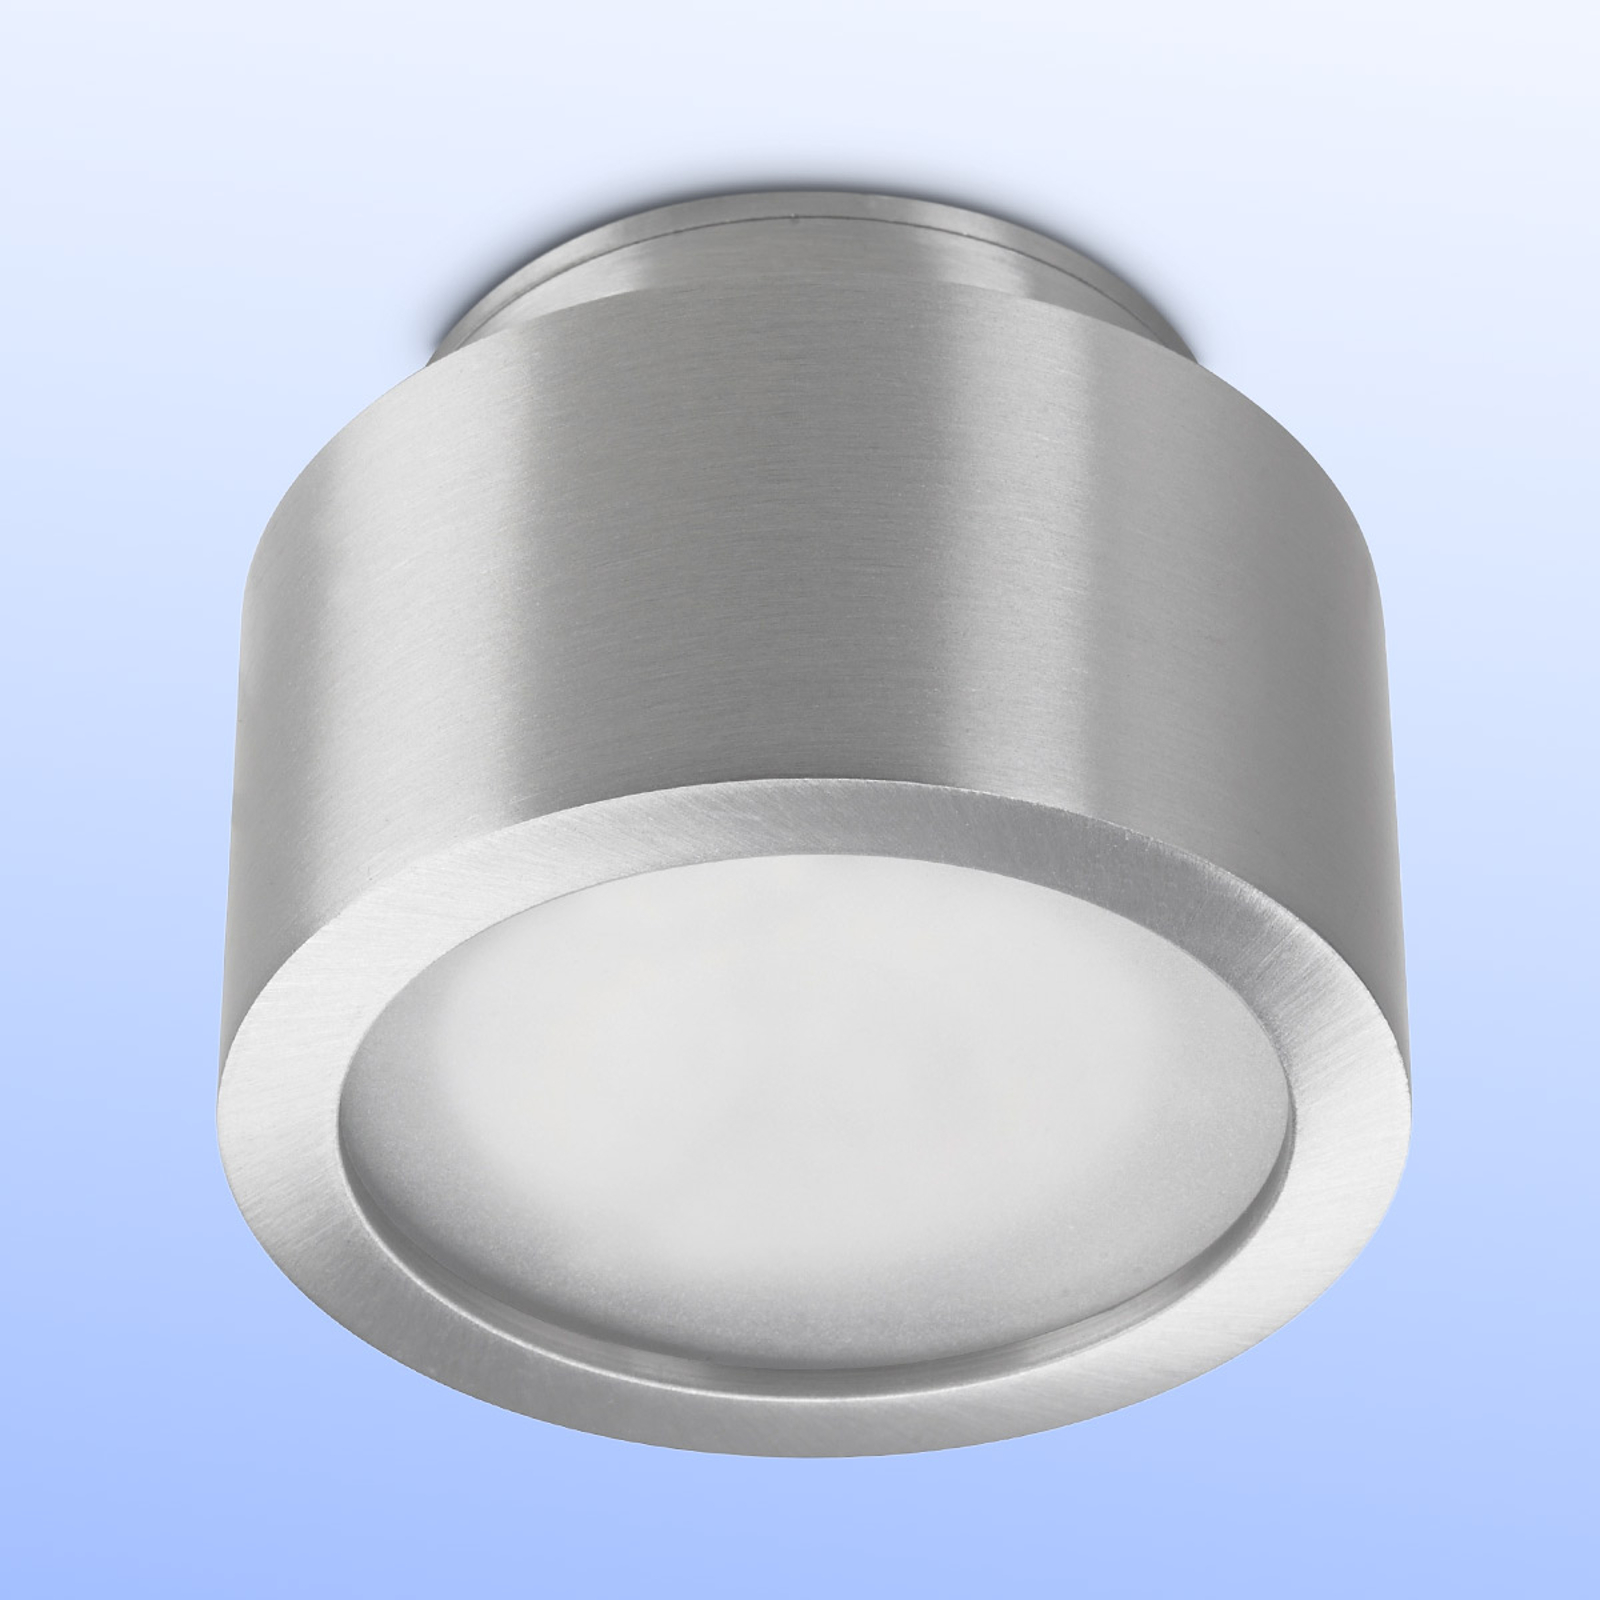 MINIPLAFON – łazienkowa lampa sufitowa z LED